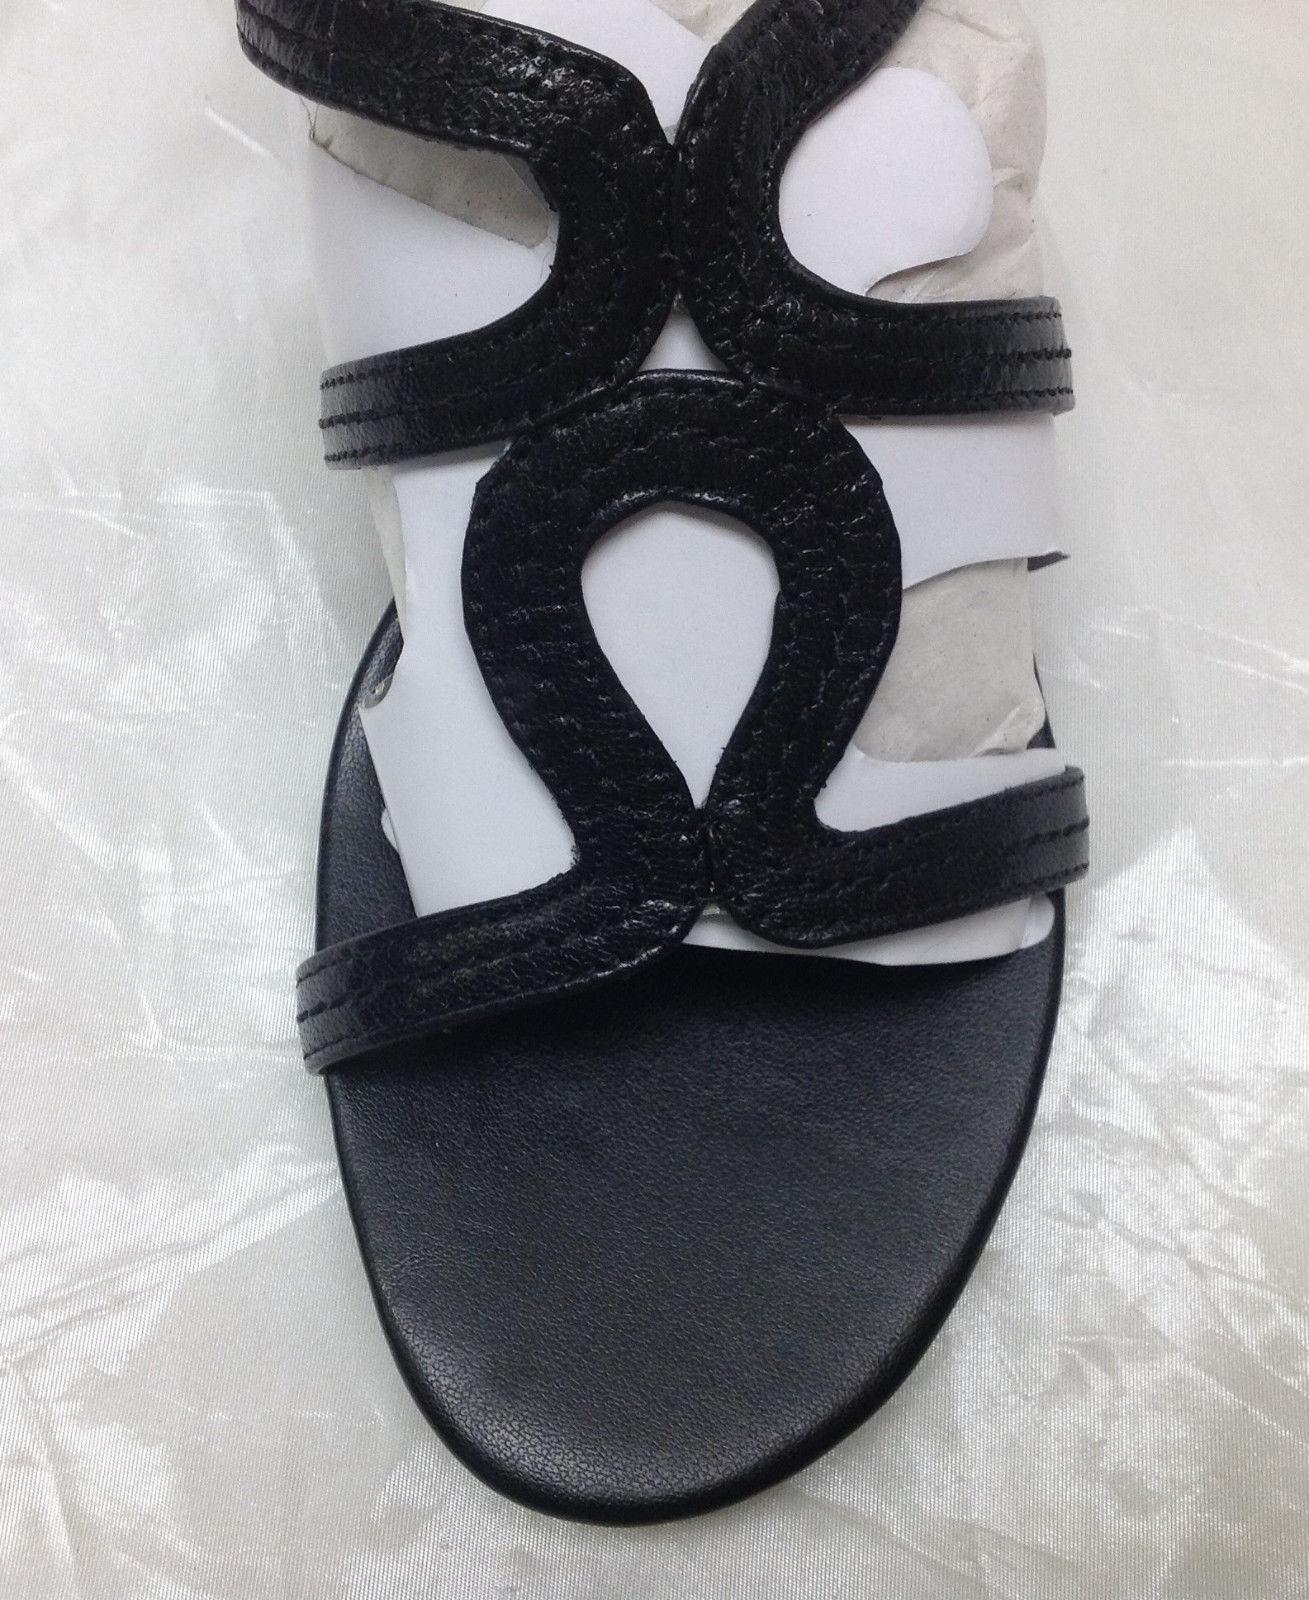 Andrew Women's Geller Leather Multi-Strap Gladiator Sandals, Black, Size 6M